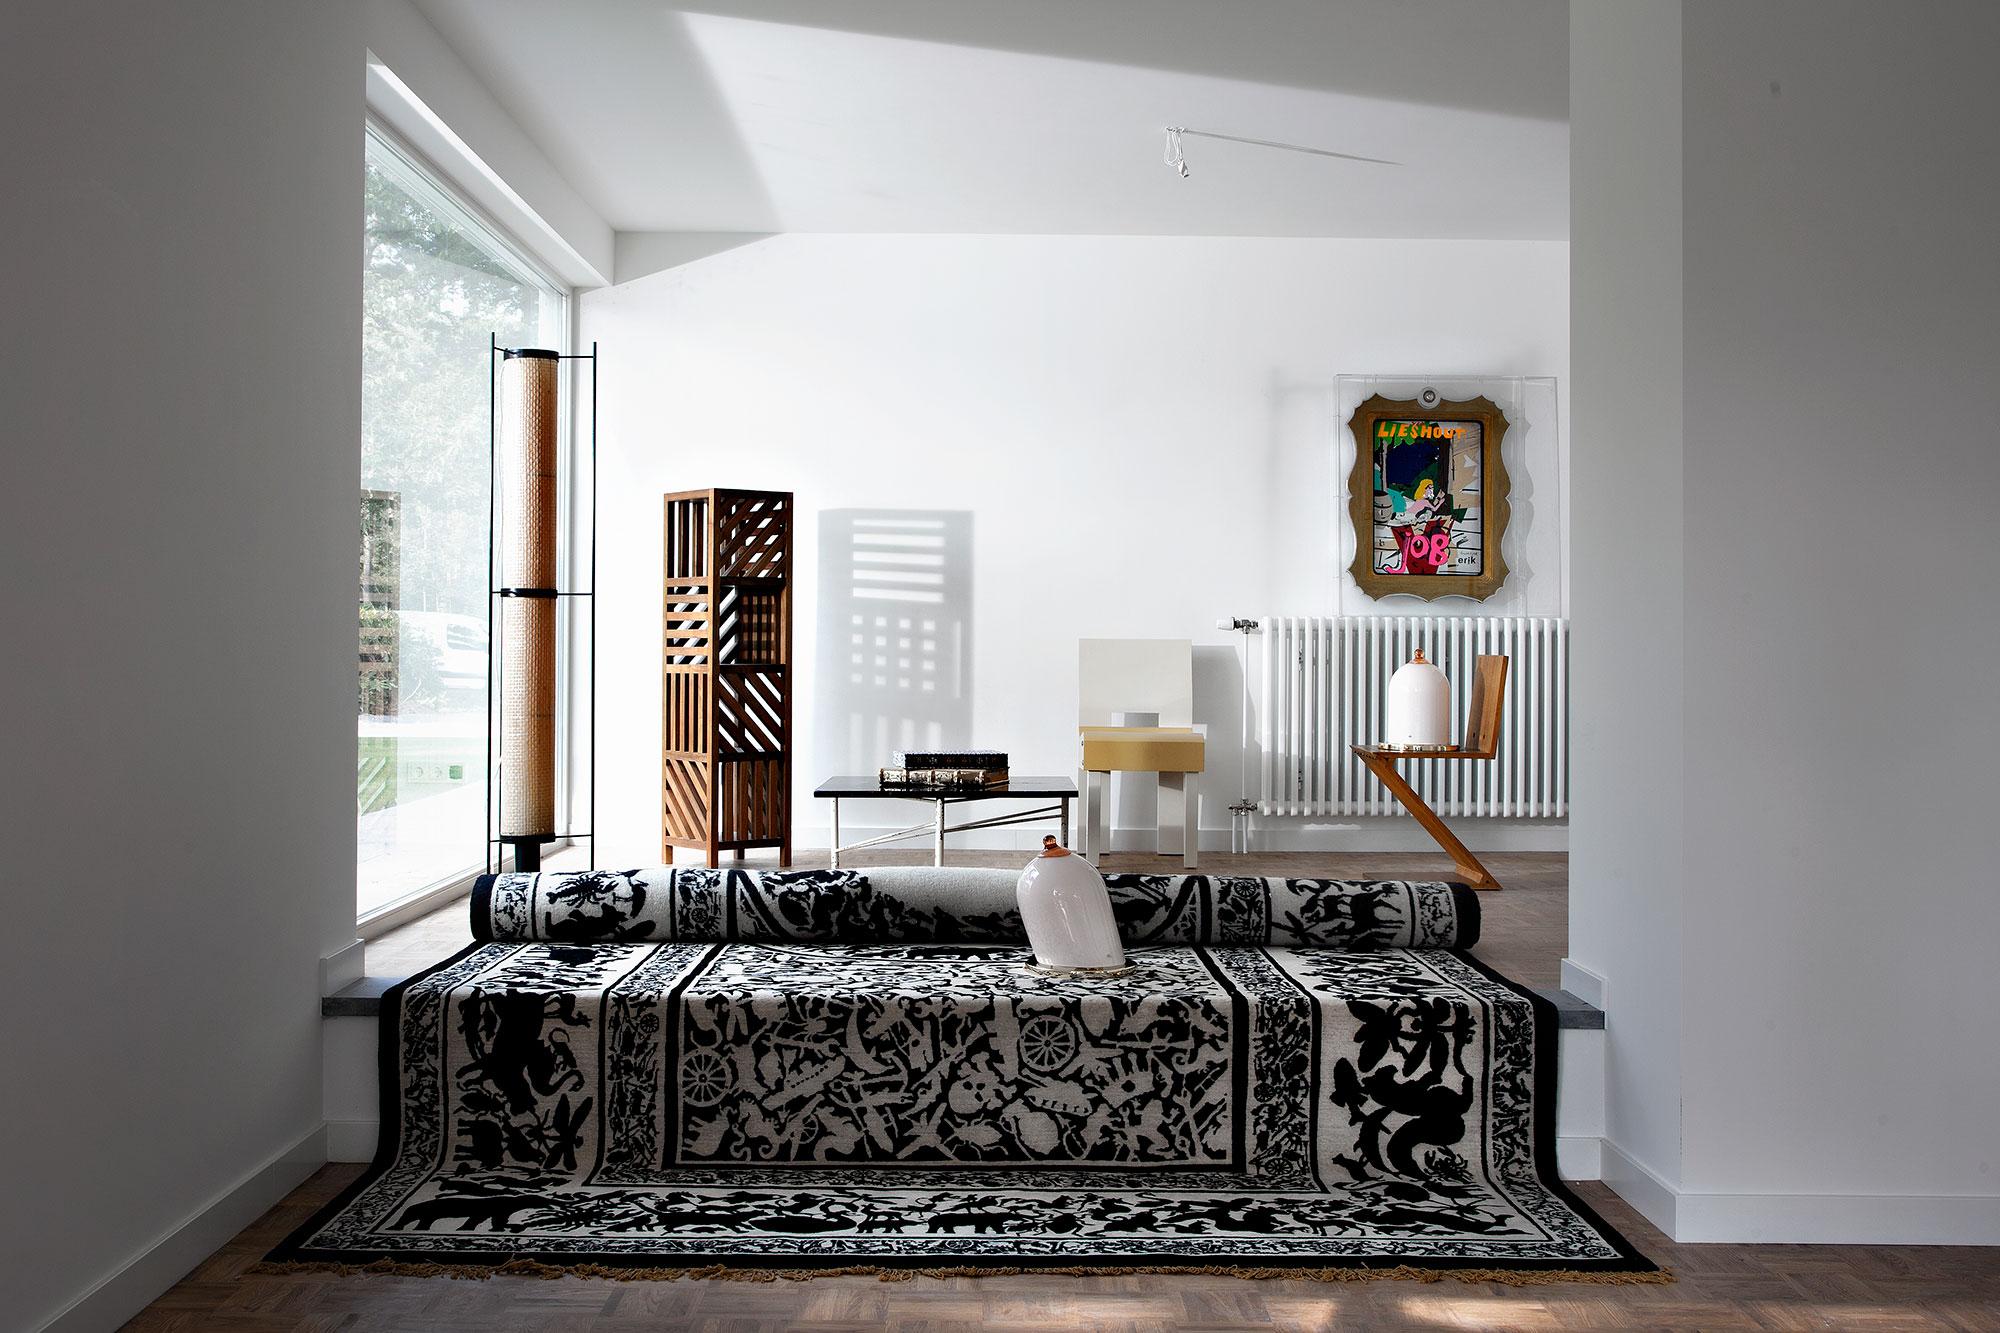 Studio-Job-House-floor0-living-room-making-of